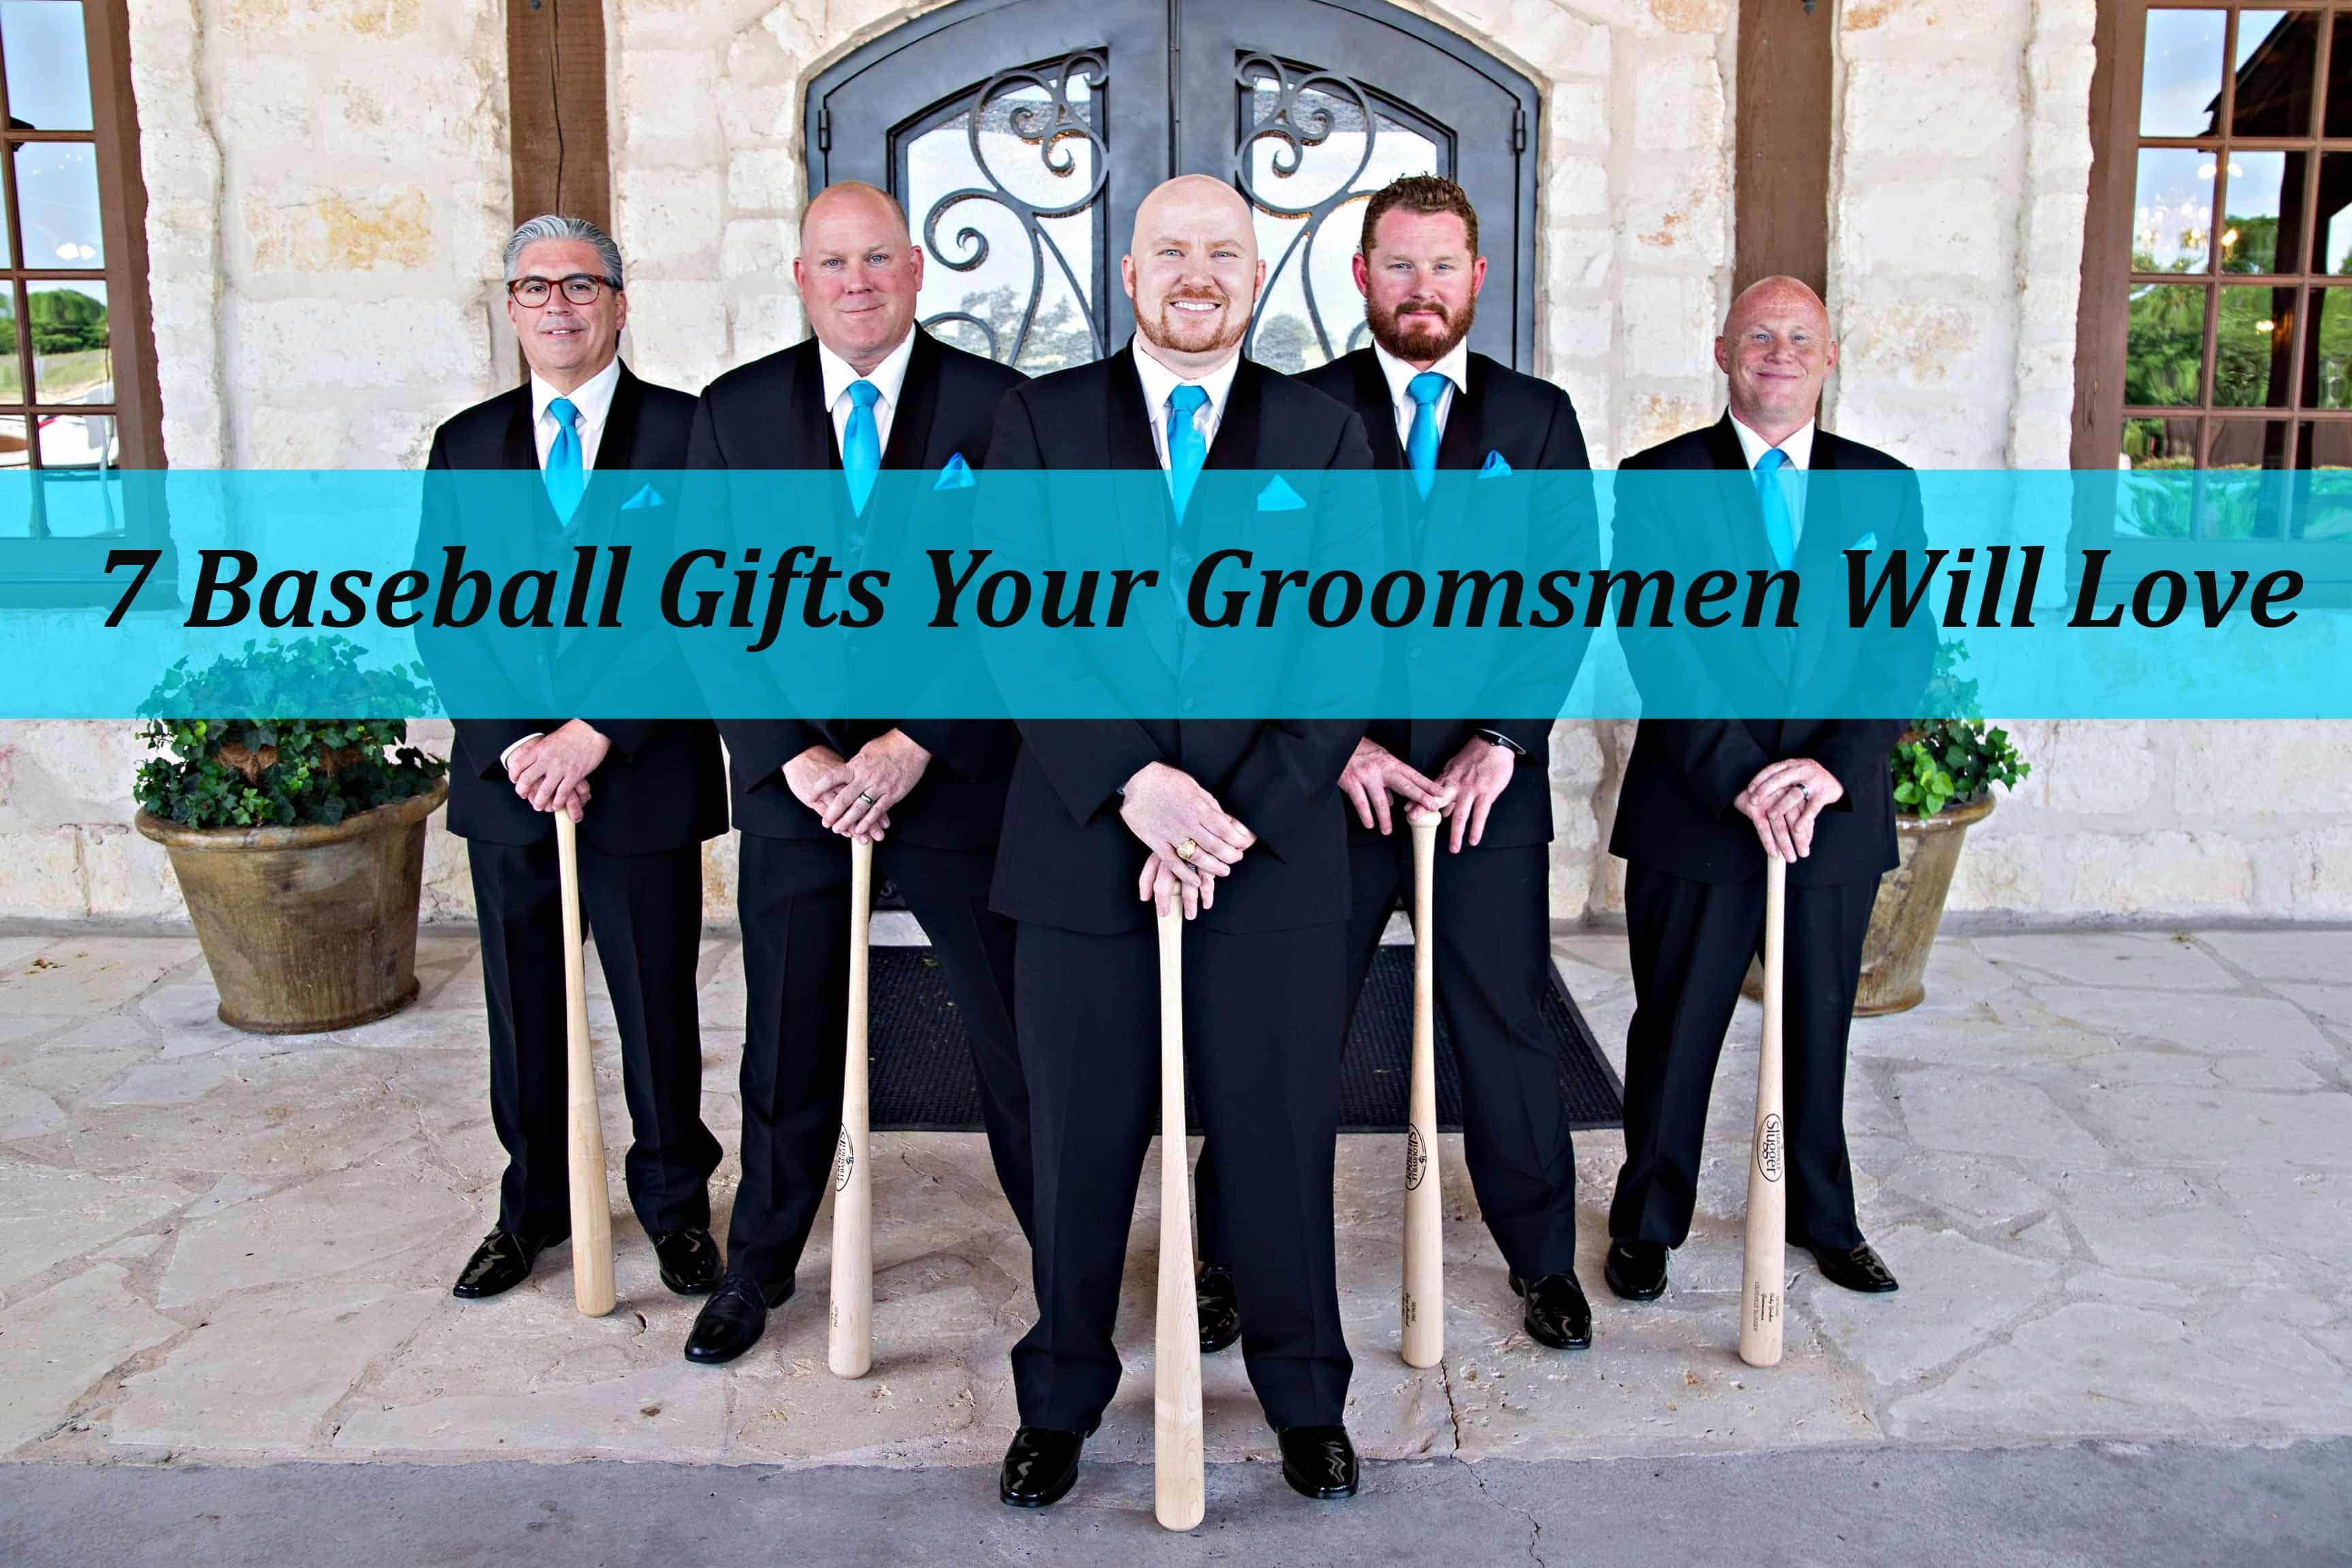 7 Baseball Gifts Your Groomsmen Will Love